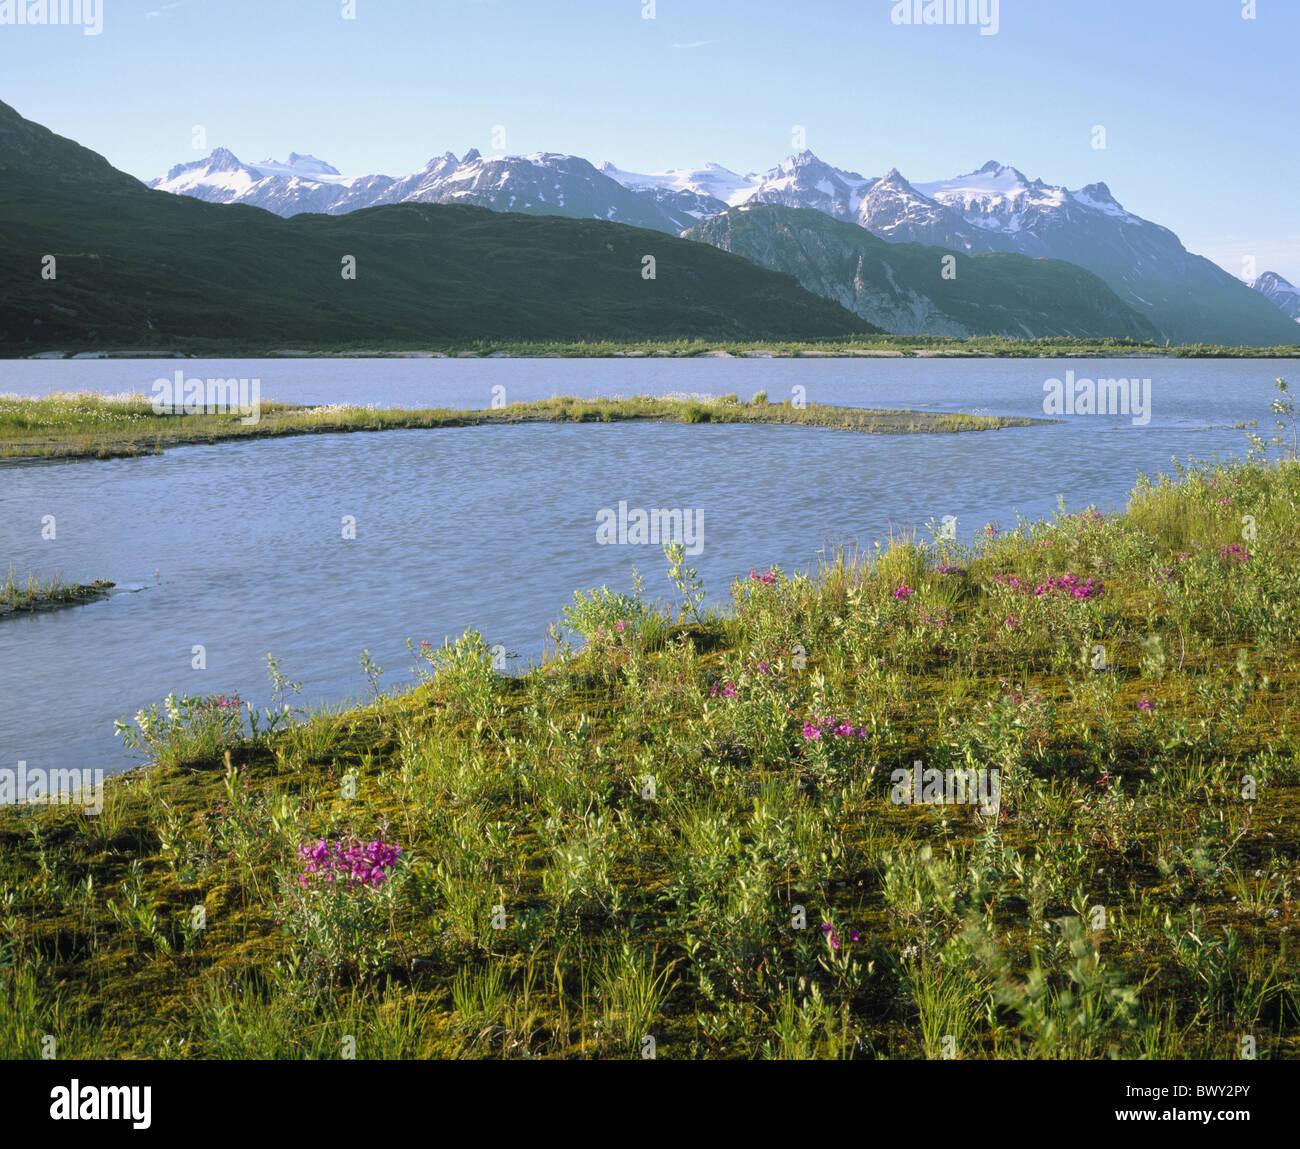 Alaska Chigmit Mountains lake Clark national park lake sea Summit lake USA America North America - Stock Image